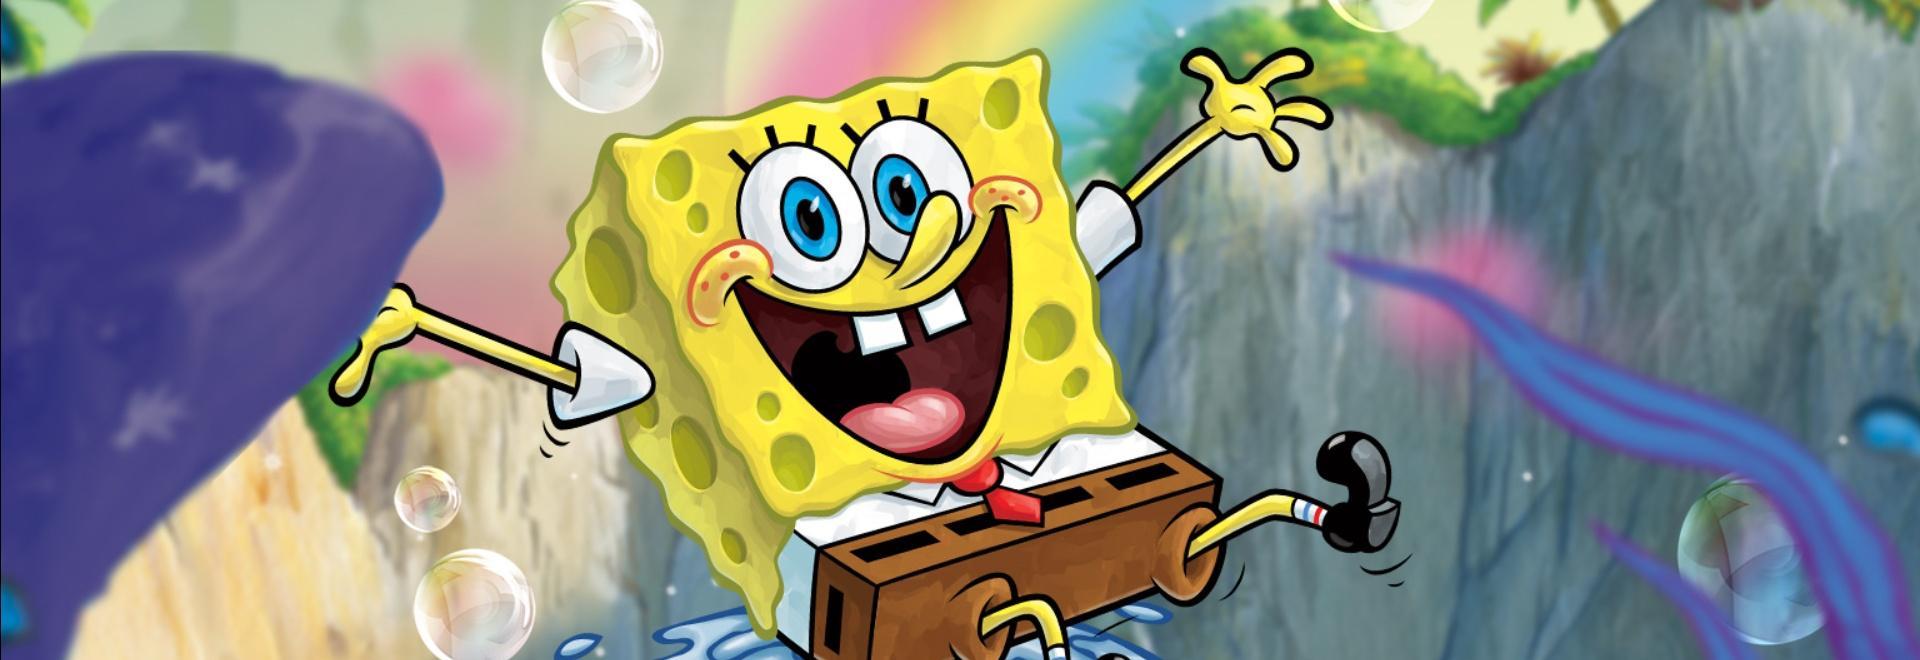 L'imitatore folle / Residenza Spongebob